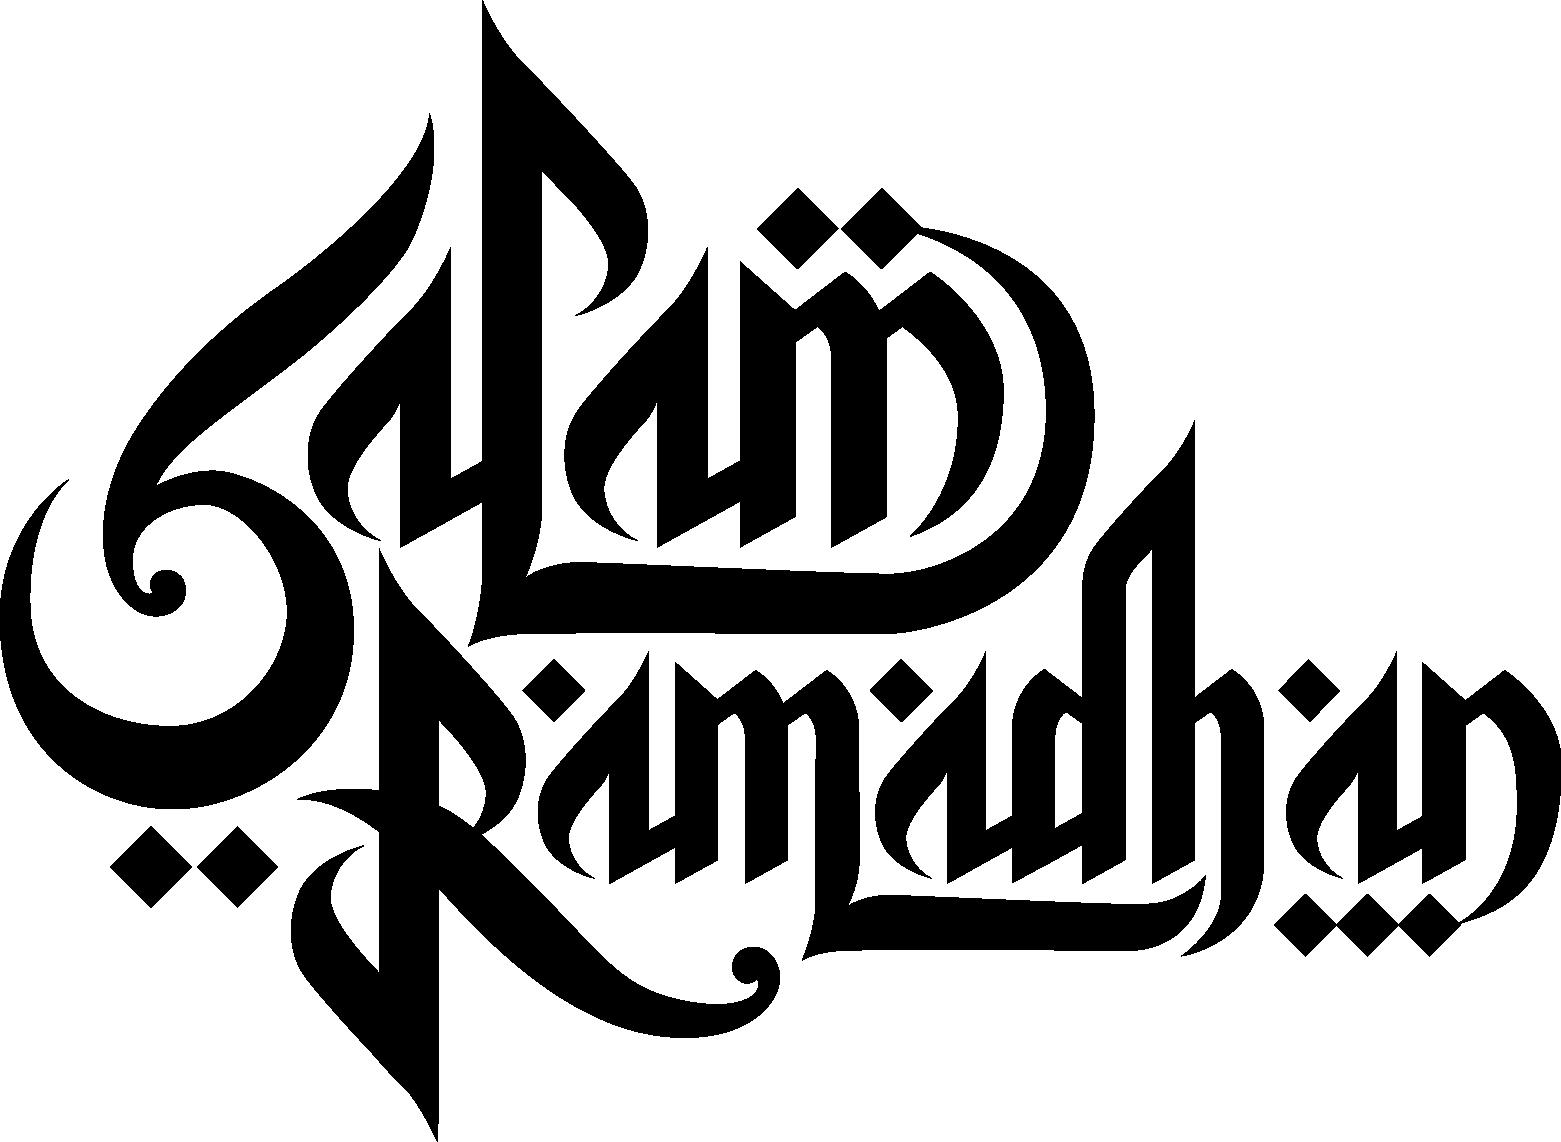 Labyrinthes difficiles also Atividades Para Alfabetizar in addition 340244 Zoologie Insecte Volant Libellule Rouge Possedant Un Dard Paralysant Bout De Labdomen in addition 6dfaefeaafcffb7f likewise Il Sistema Lo otore Lo Schel73741. on pos